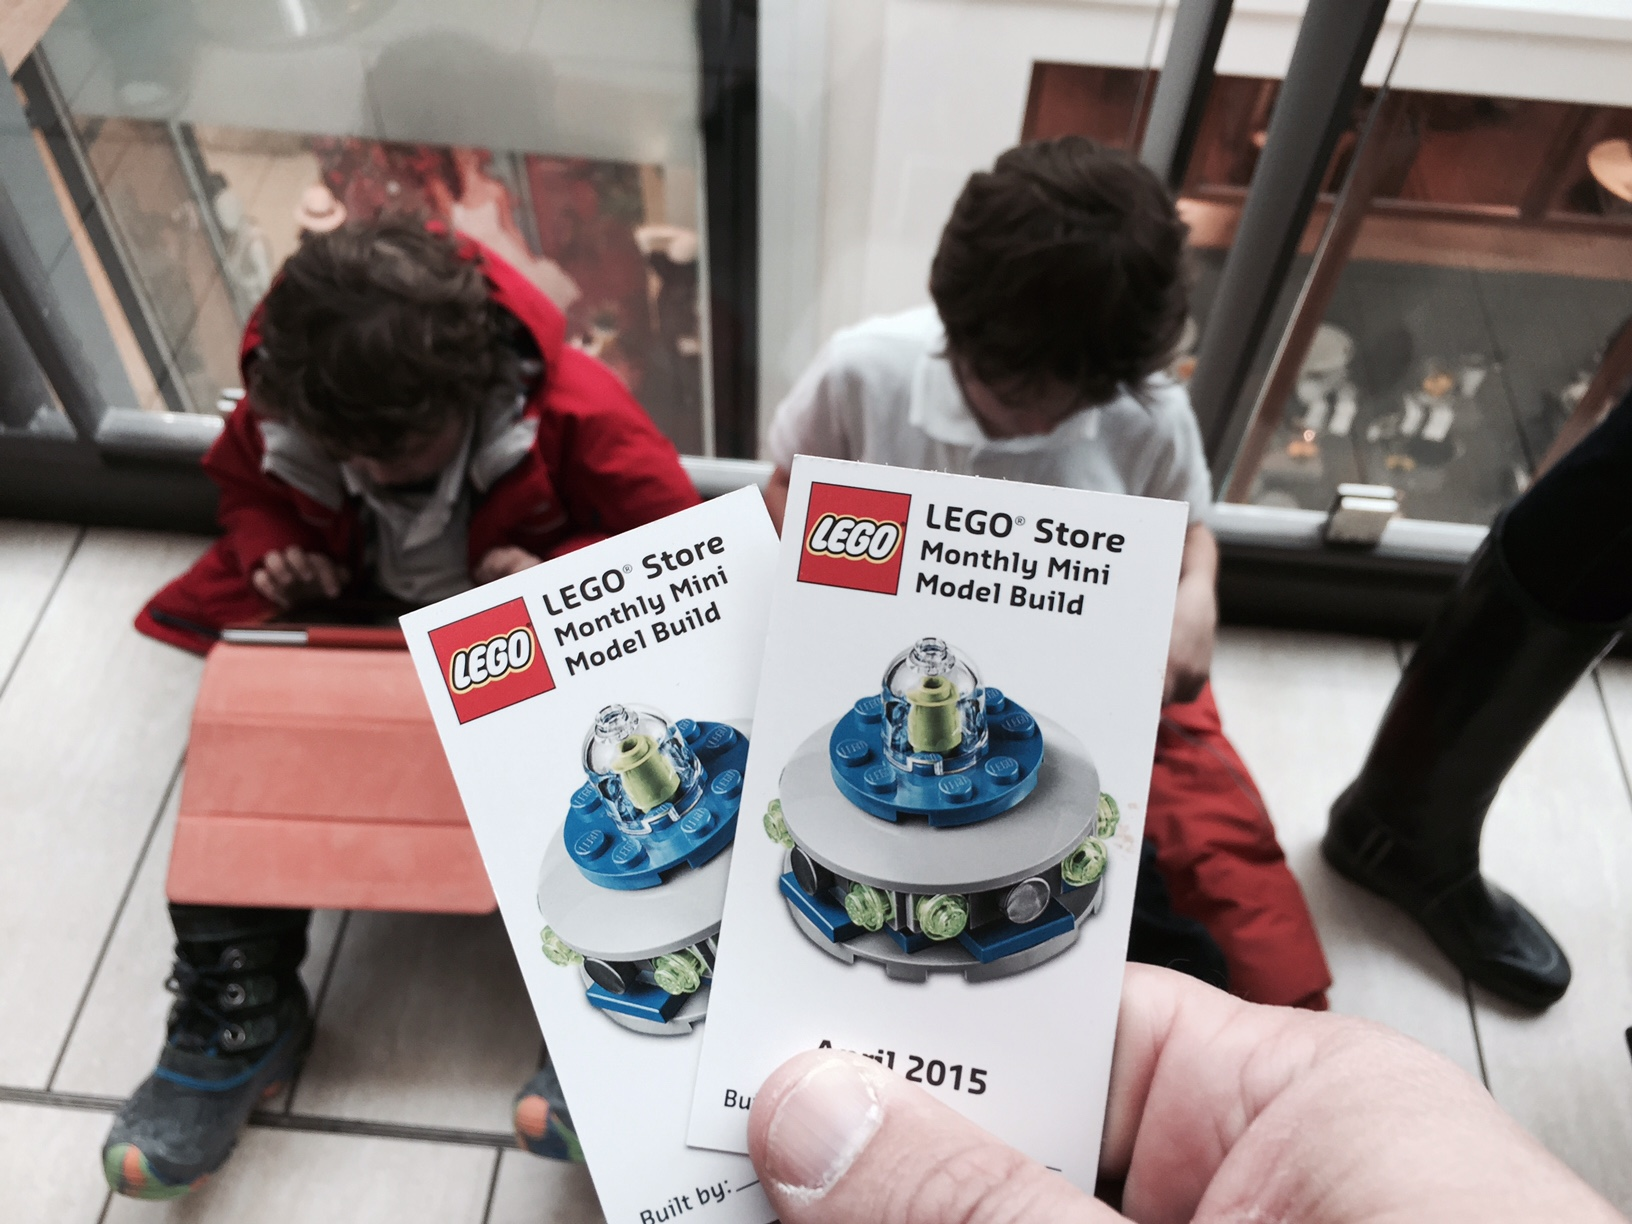 lego mini build night at the lego store bring snacks lego mini build ufo